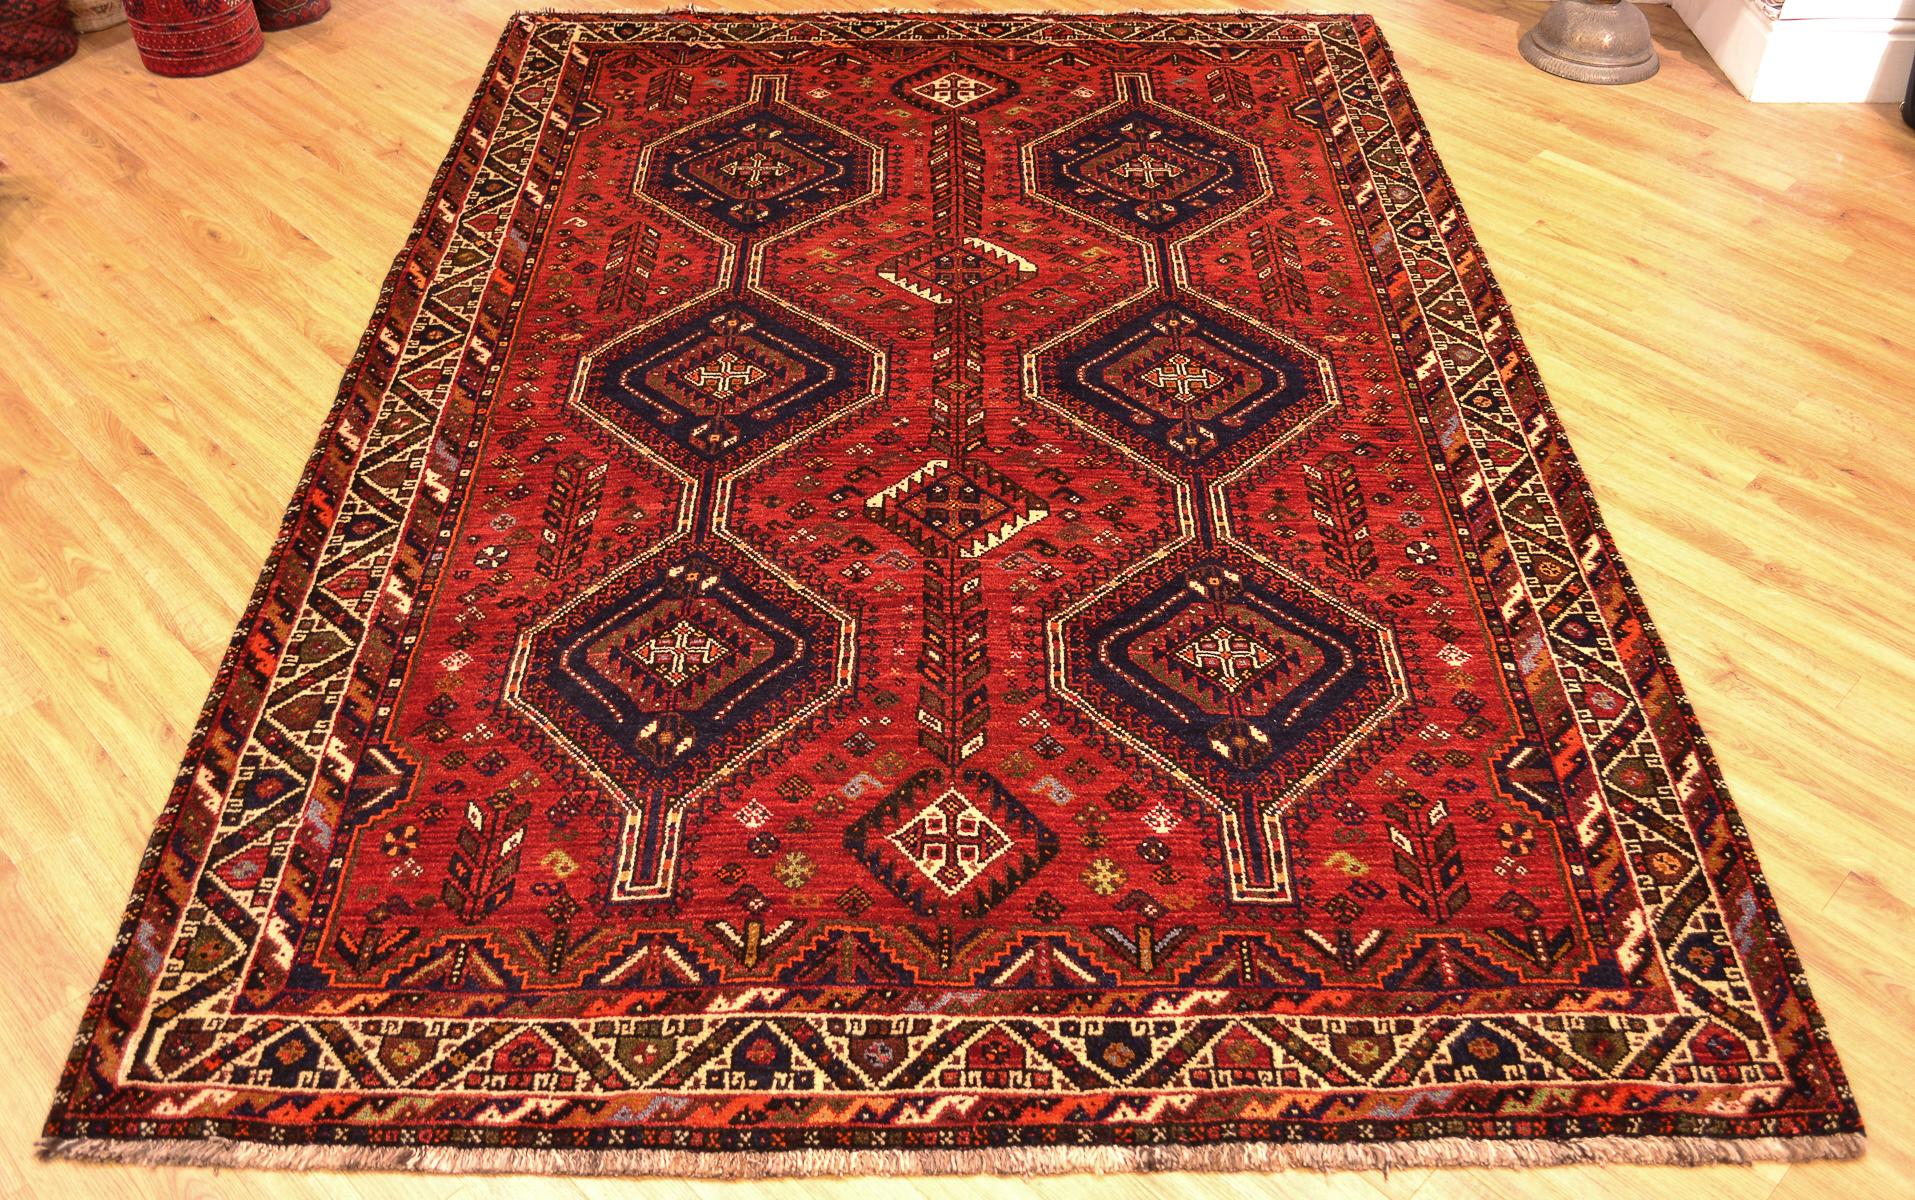 Persian Qashqai Carpet 2 52x1 80m The Oriental Rug Merchant